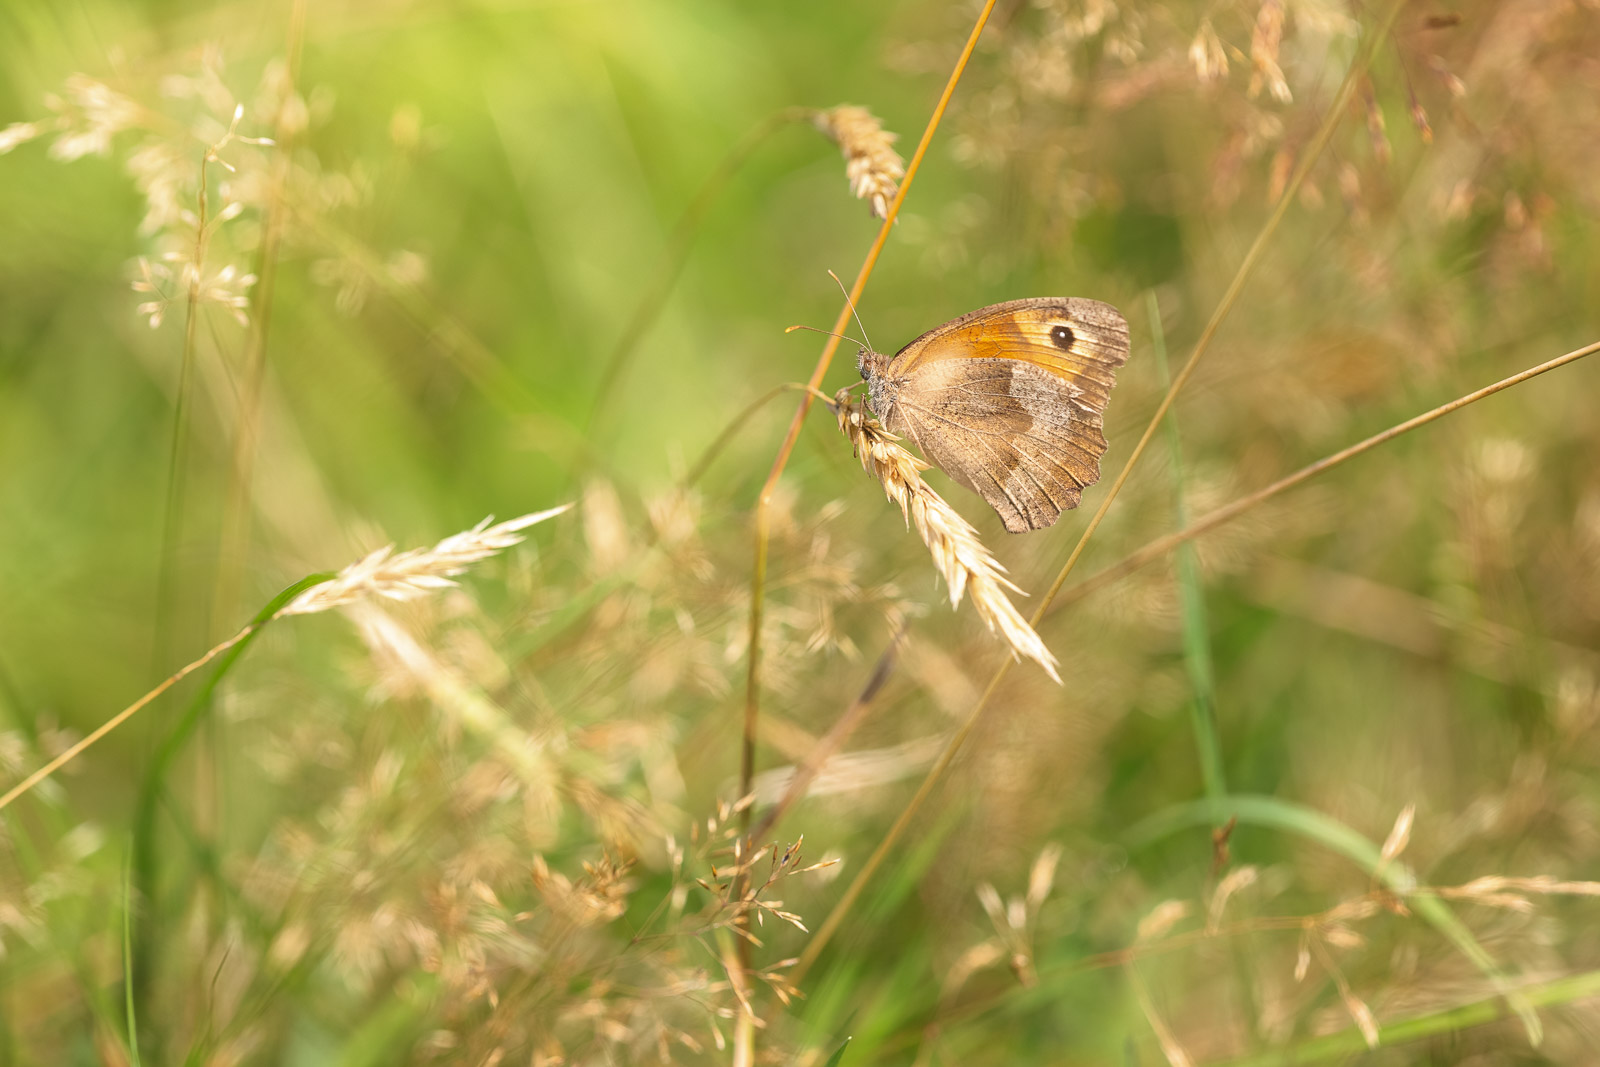 Meadow Brown (Maniola jurtina) - Lynchcombe, Mendip Hills, Somerset, UK. ID BR53953